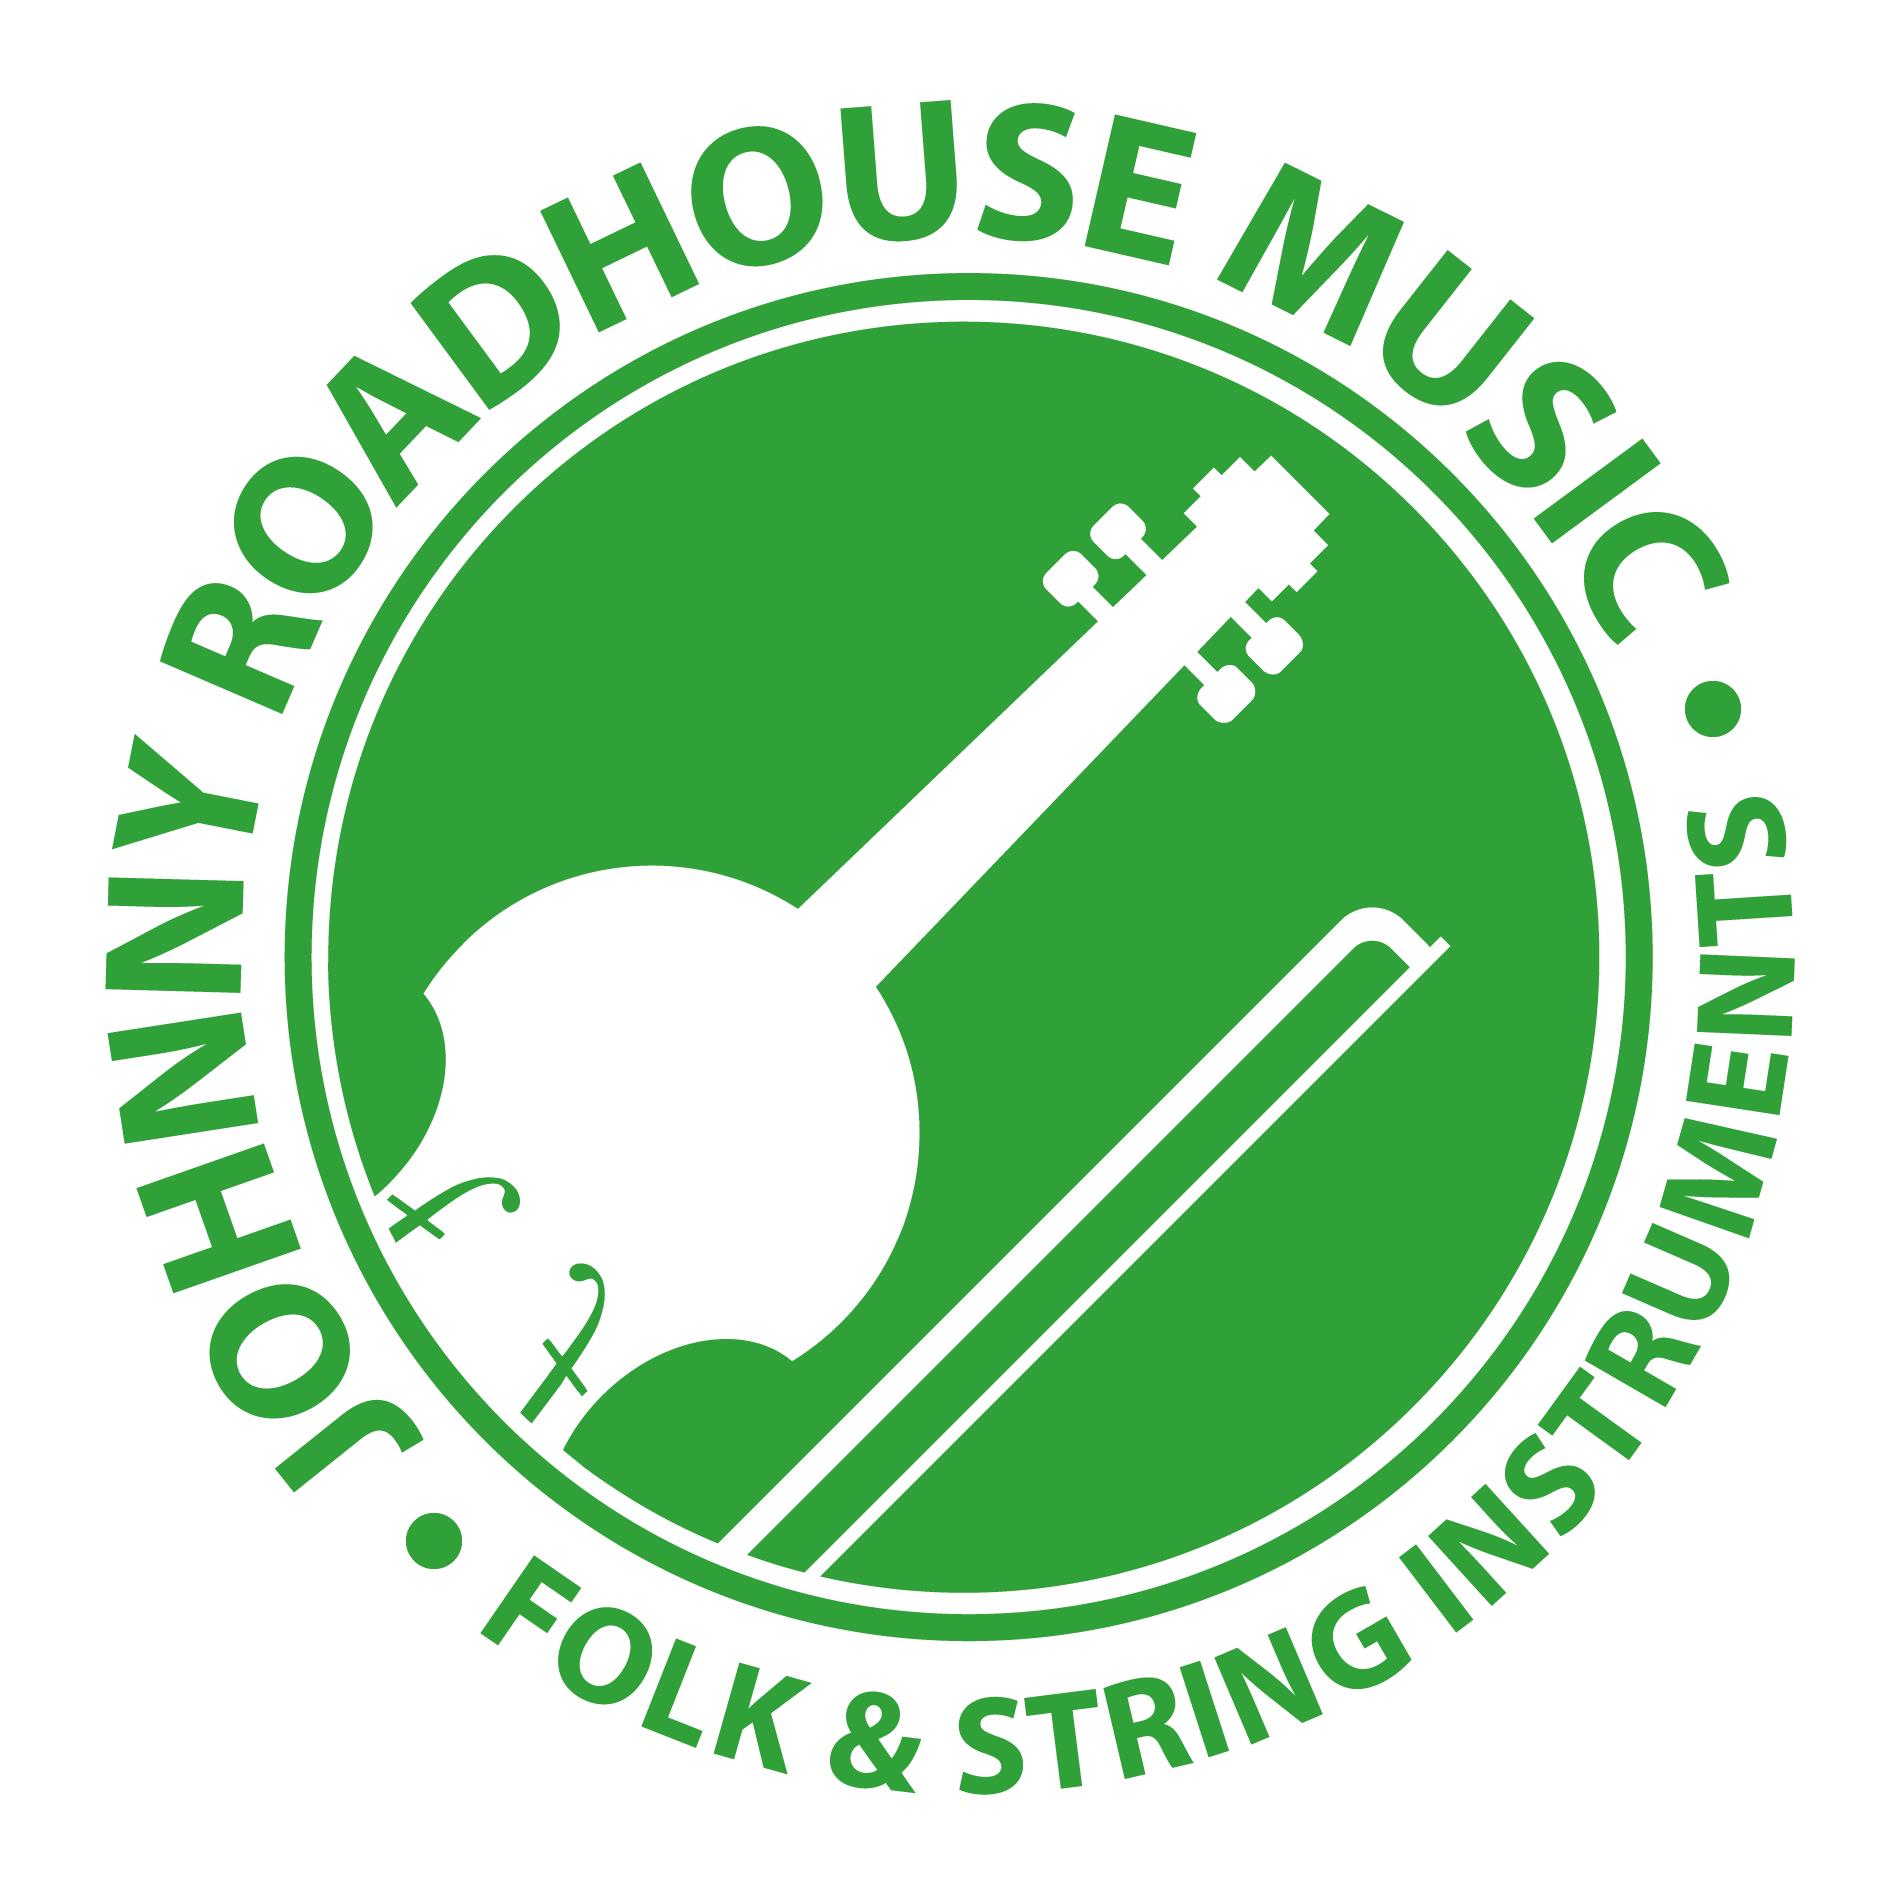 Johnny Roadhouse Music - Folk & String Department